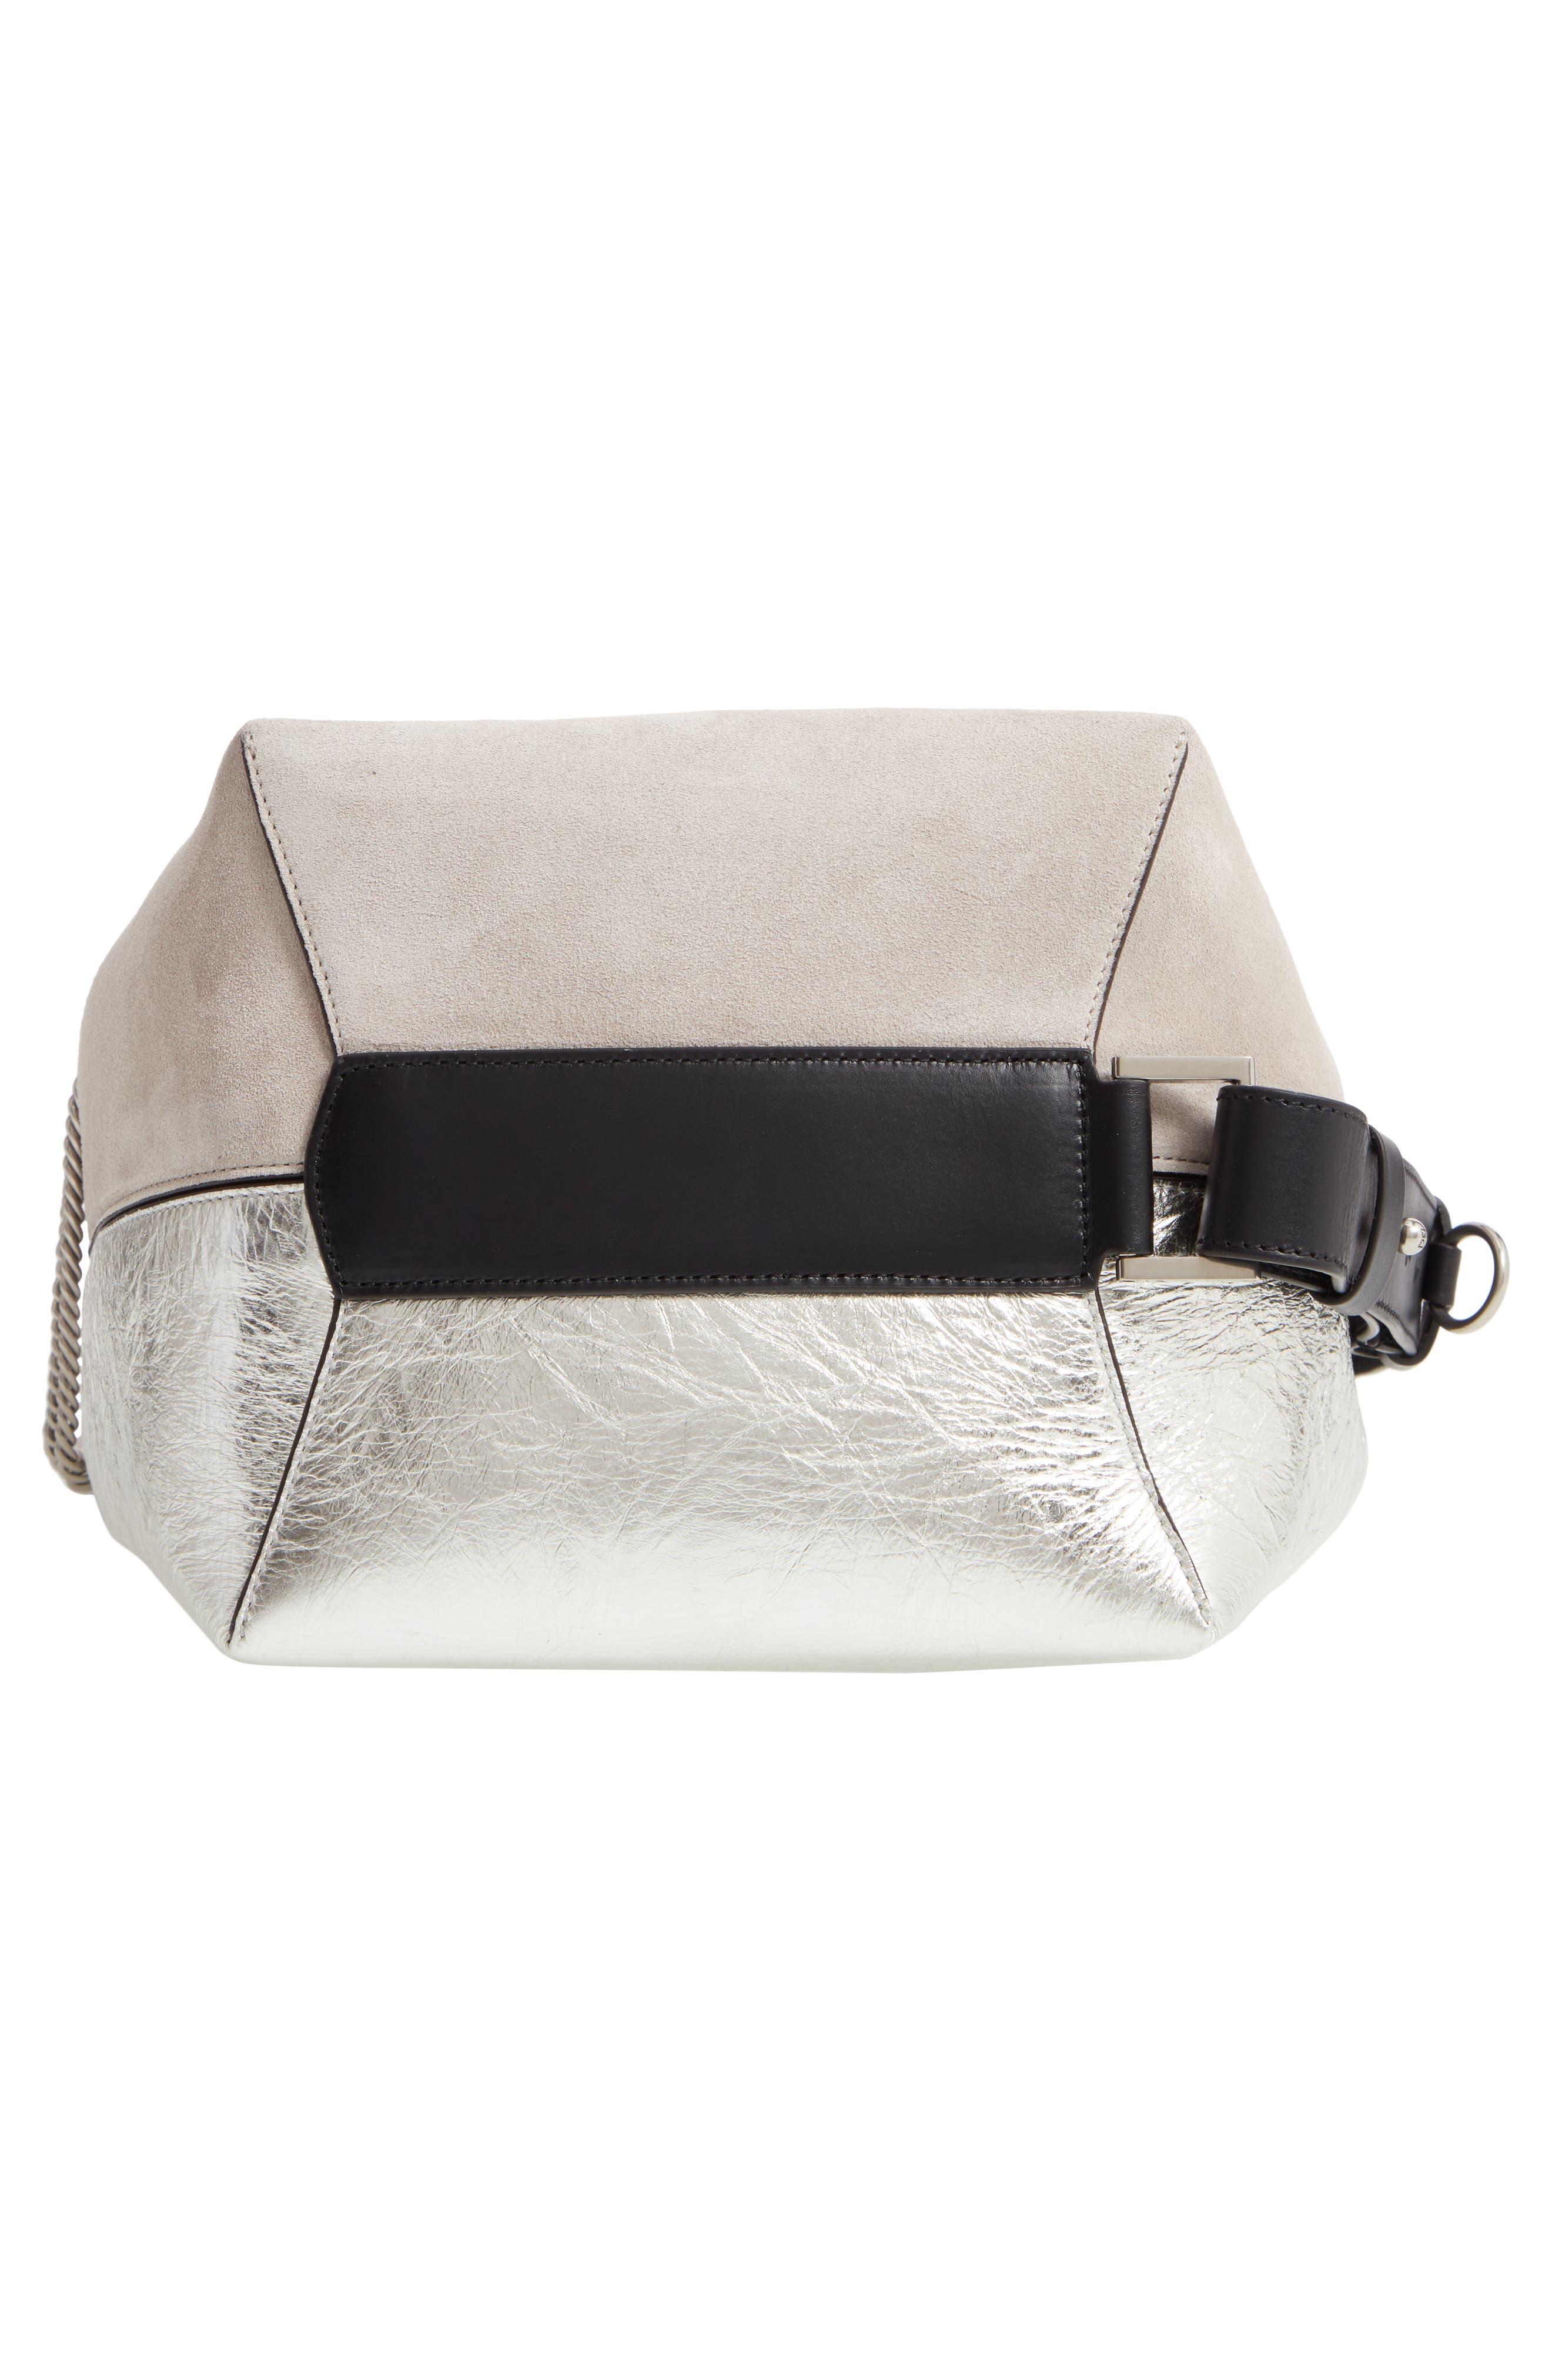 GIVENCHY, Medium GV Calfskin Suede Bucket Bag, Alternate thumbnail 7, color, NATURAL/ SILVER